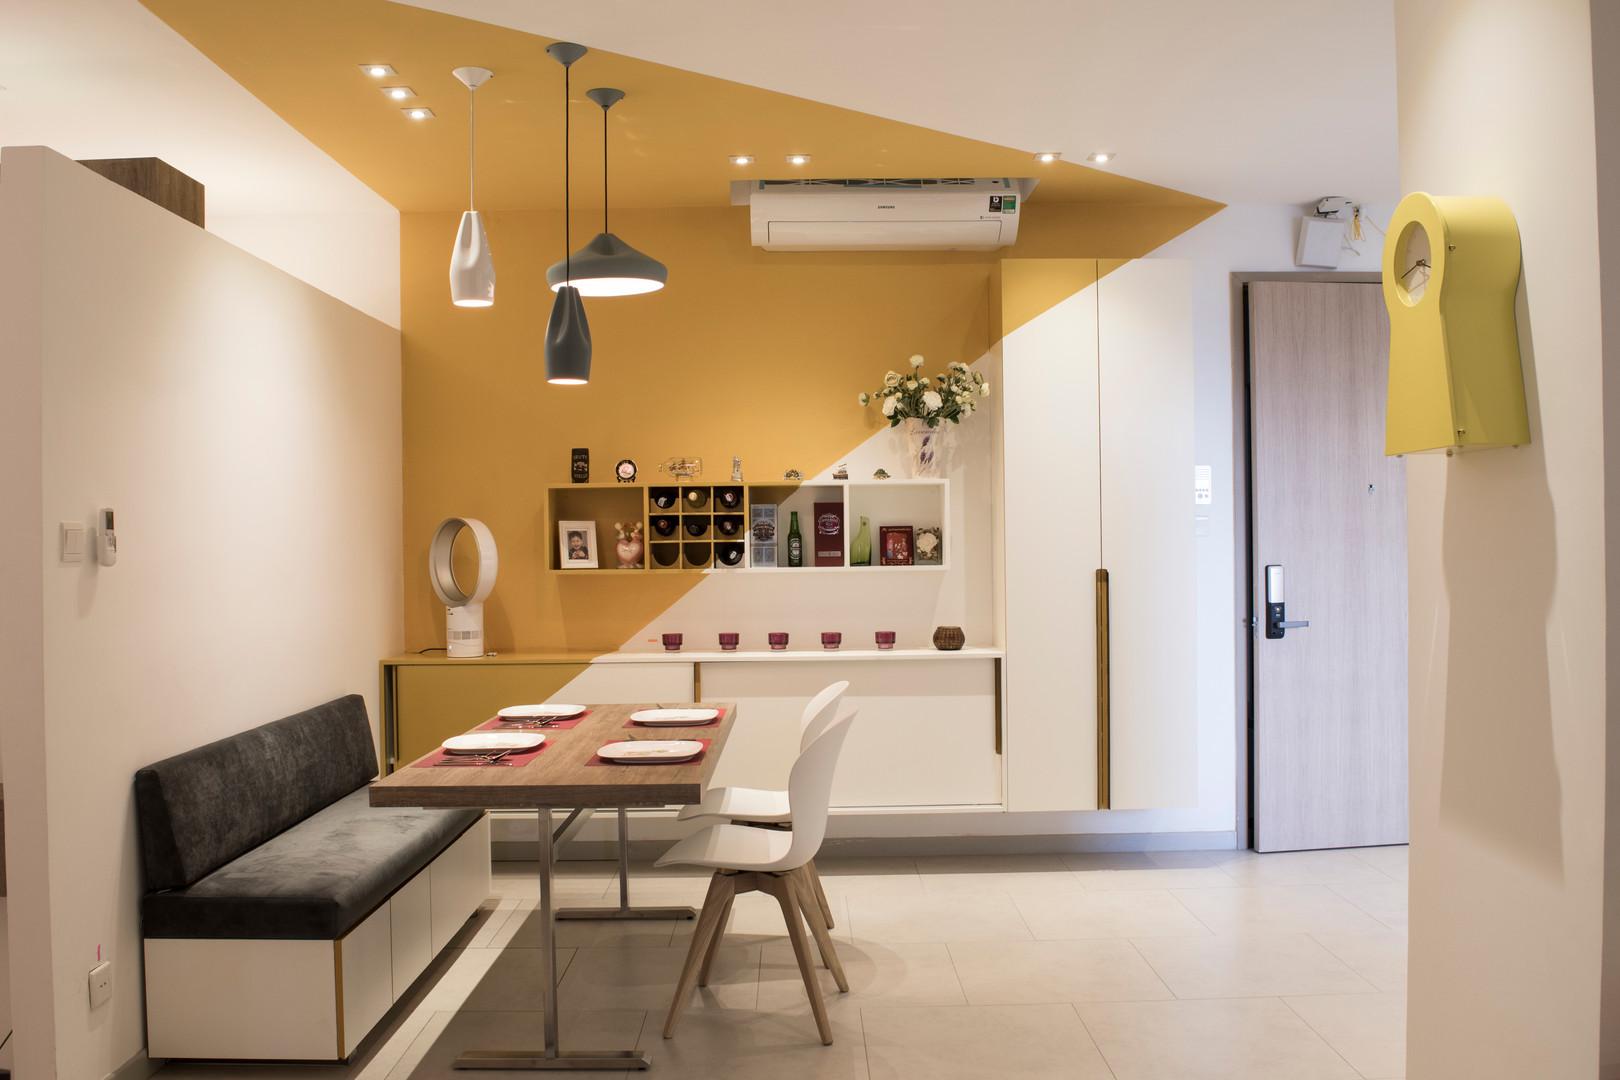 RIVIERA POINT apartment